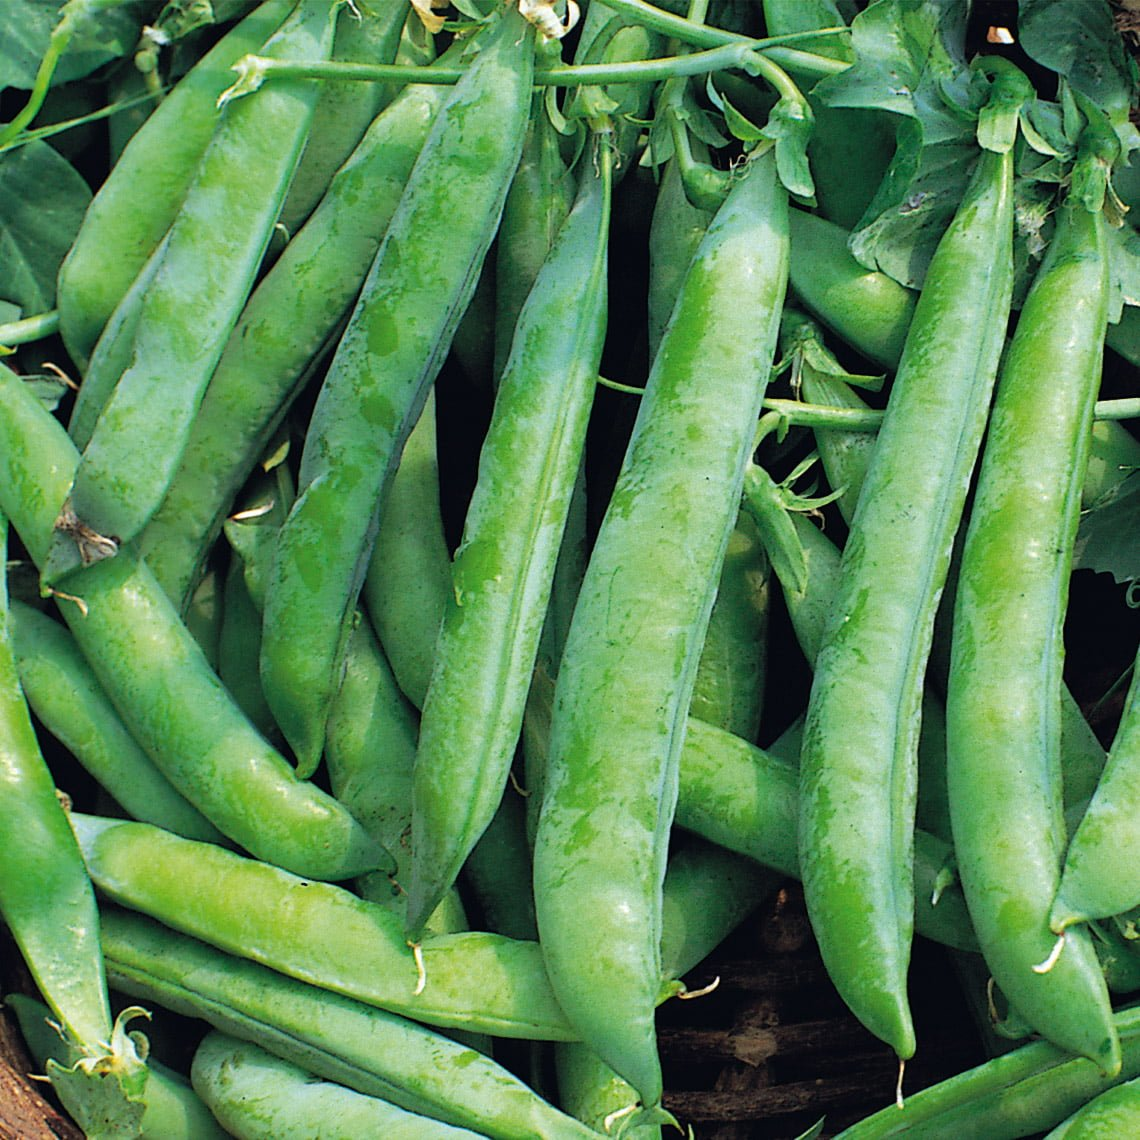 Kelvedon wonder peas